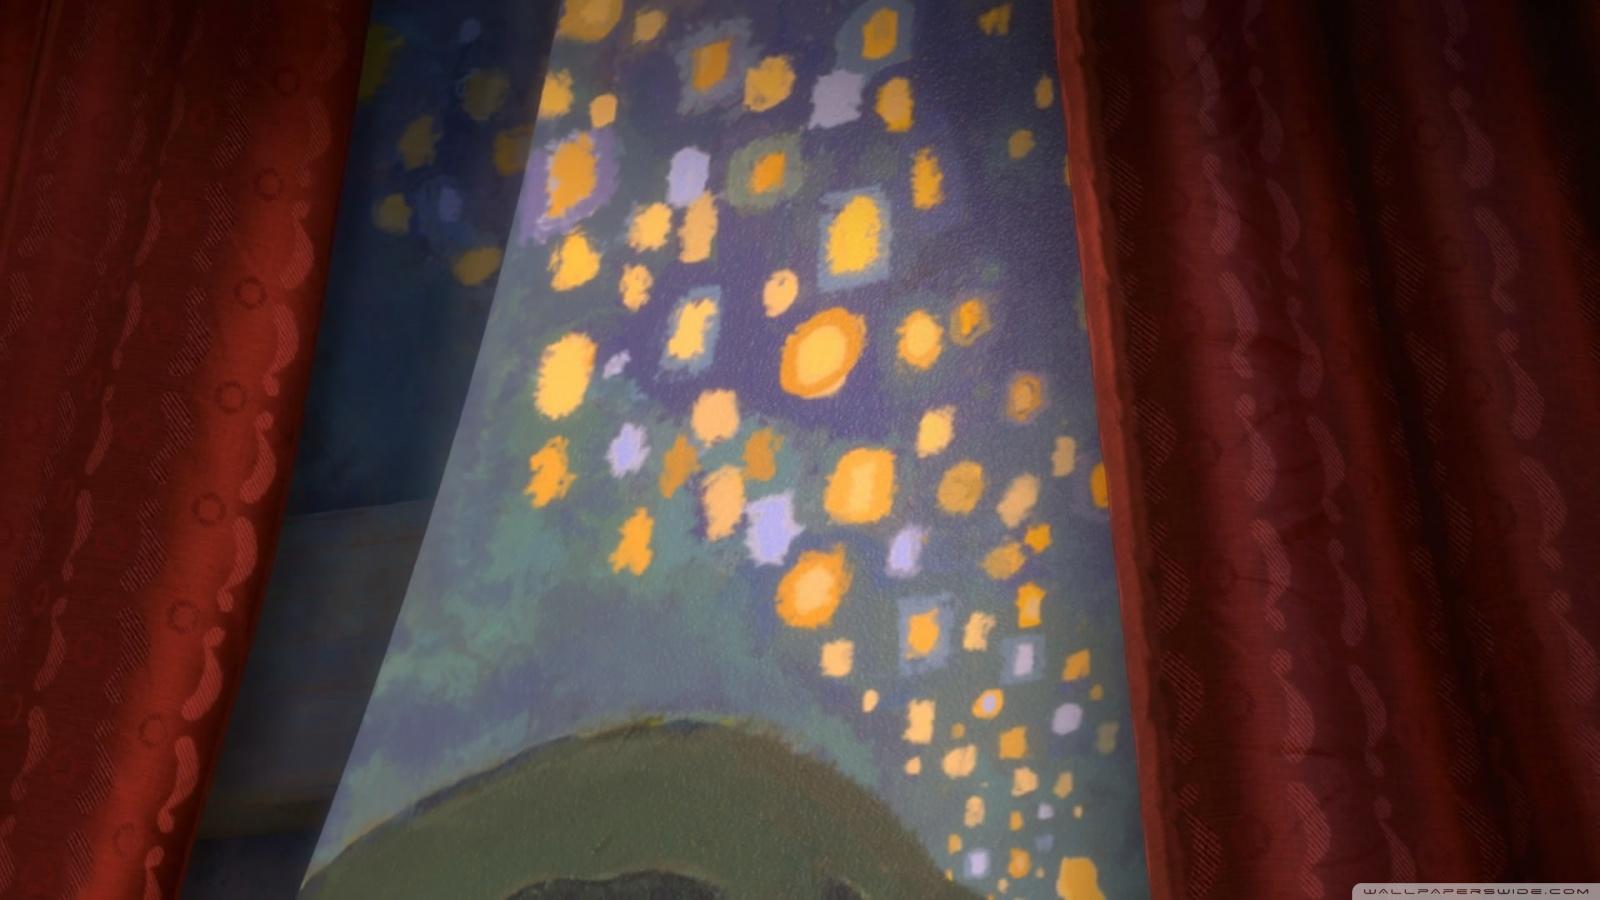 S Name Wallpaper Hd Download Tangled Rapunzel Paintings 4k Hd Desktop Wallpaper For 4k